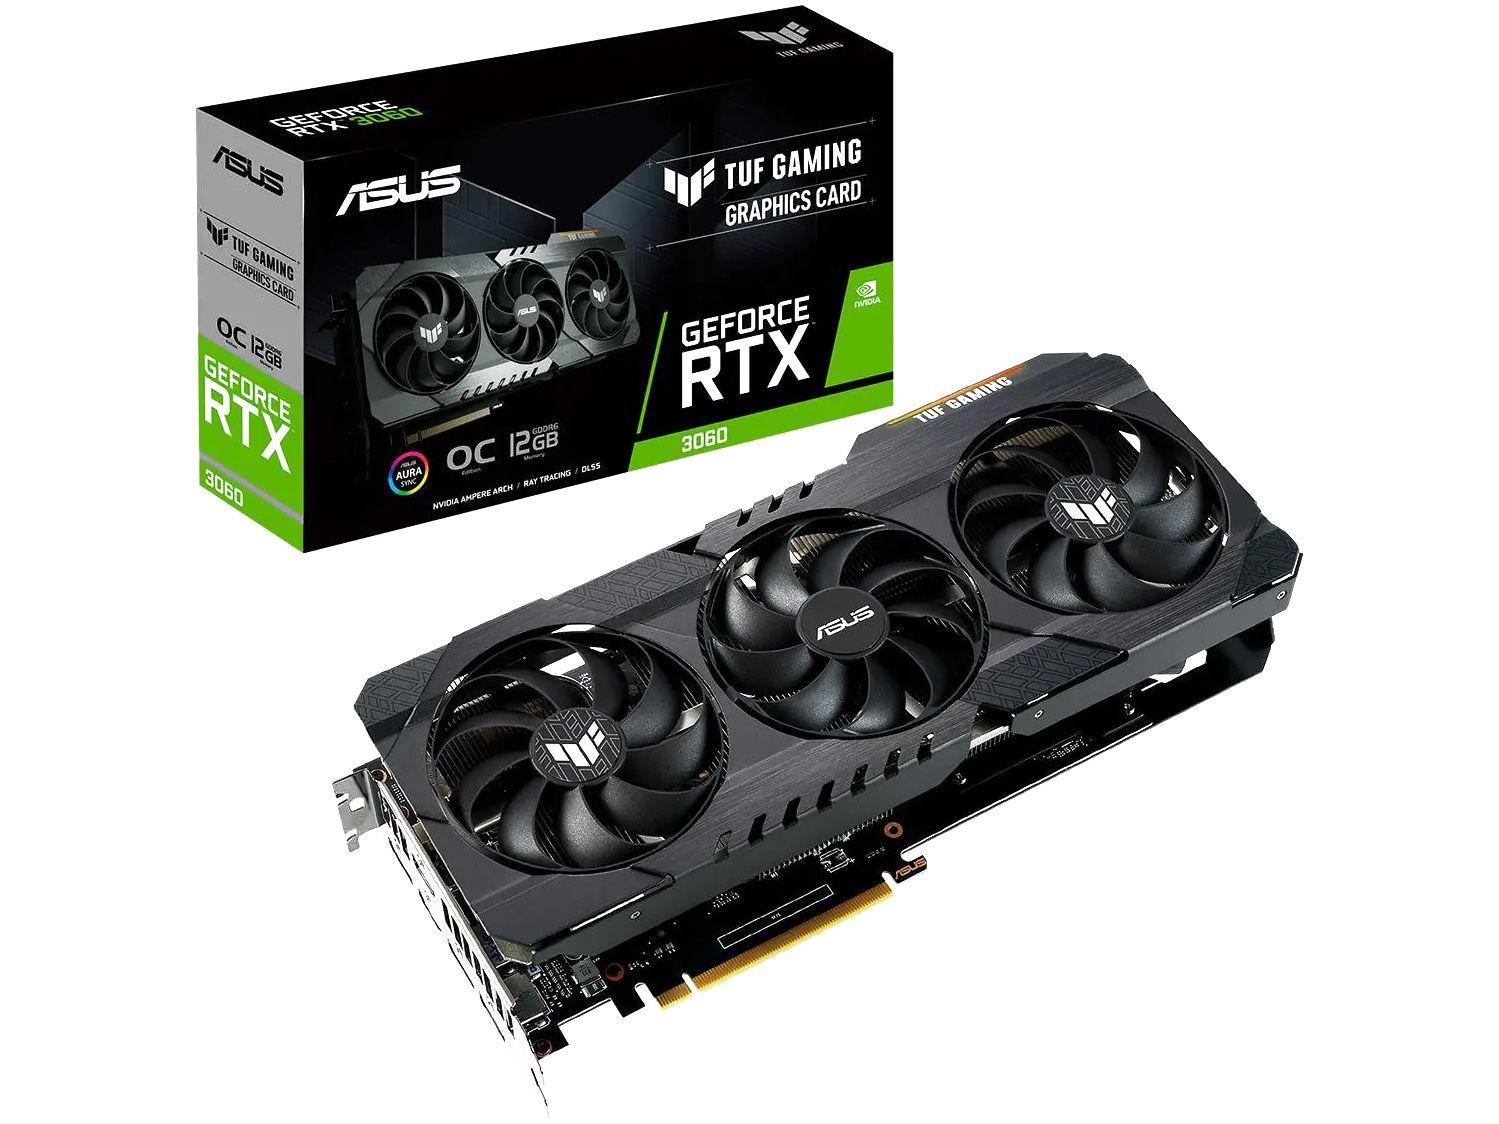 Placa de Vídeo Asus GeForce RTX 3060 - 12GB GDDR6 192 bits TUF Gaming TUFRTX3060O12GG